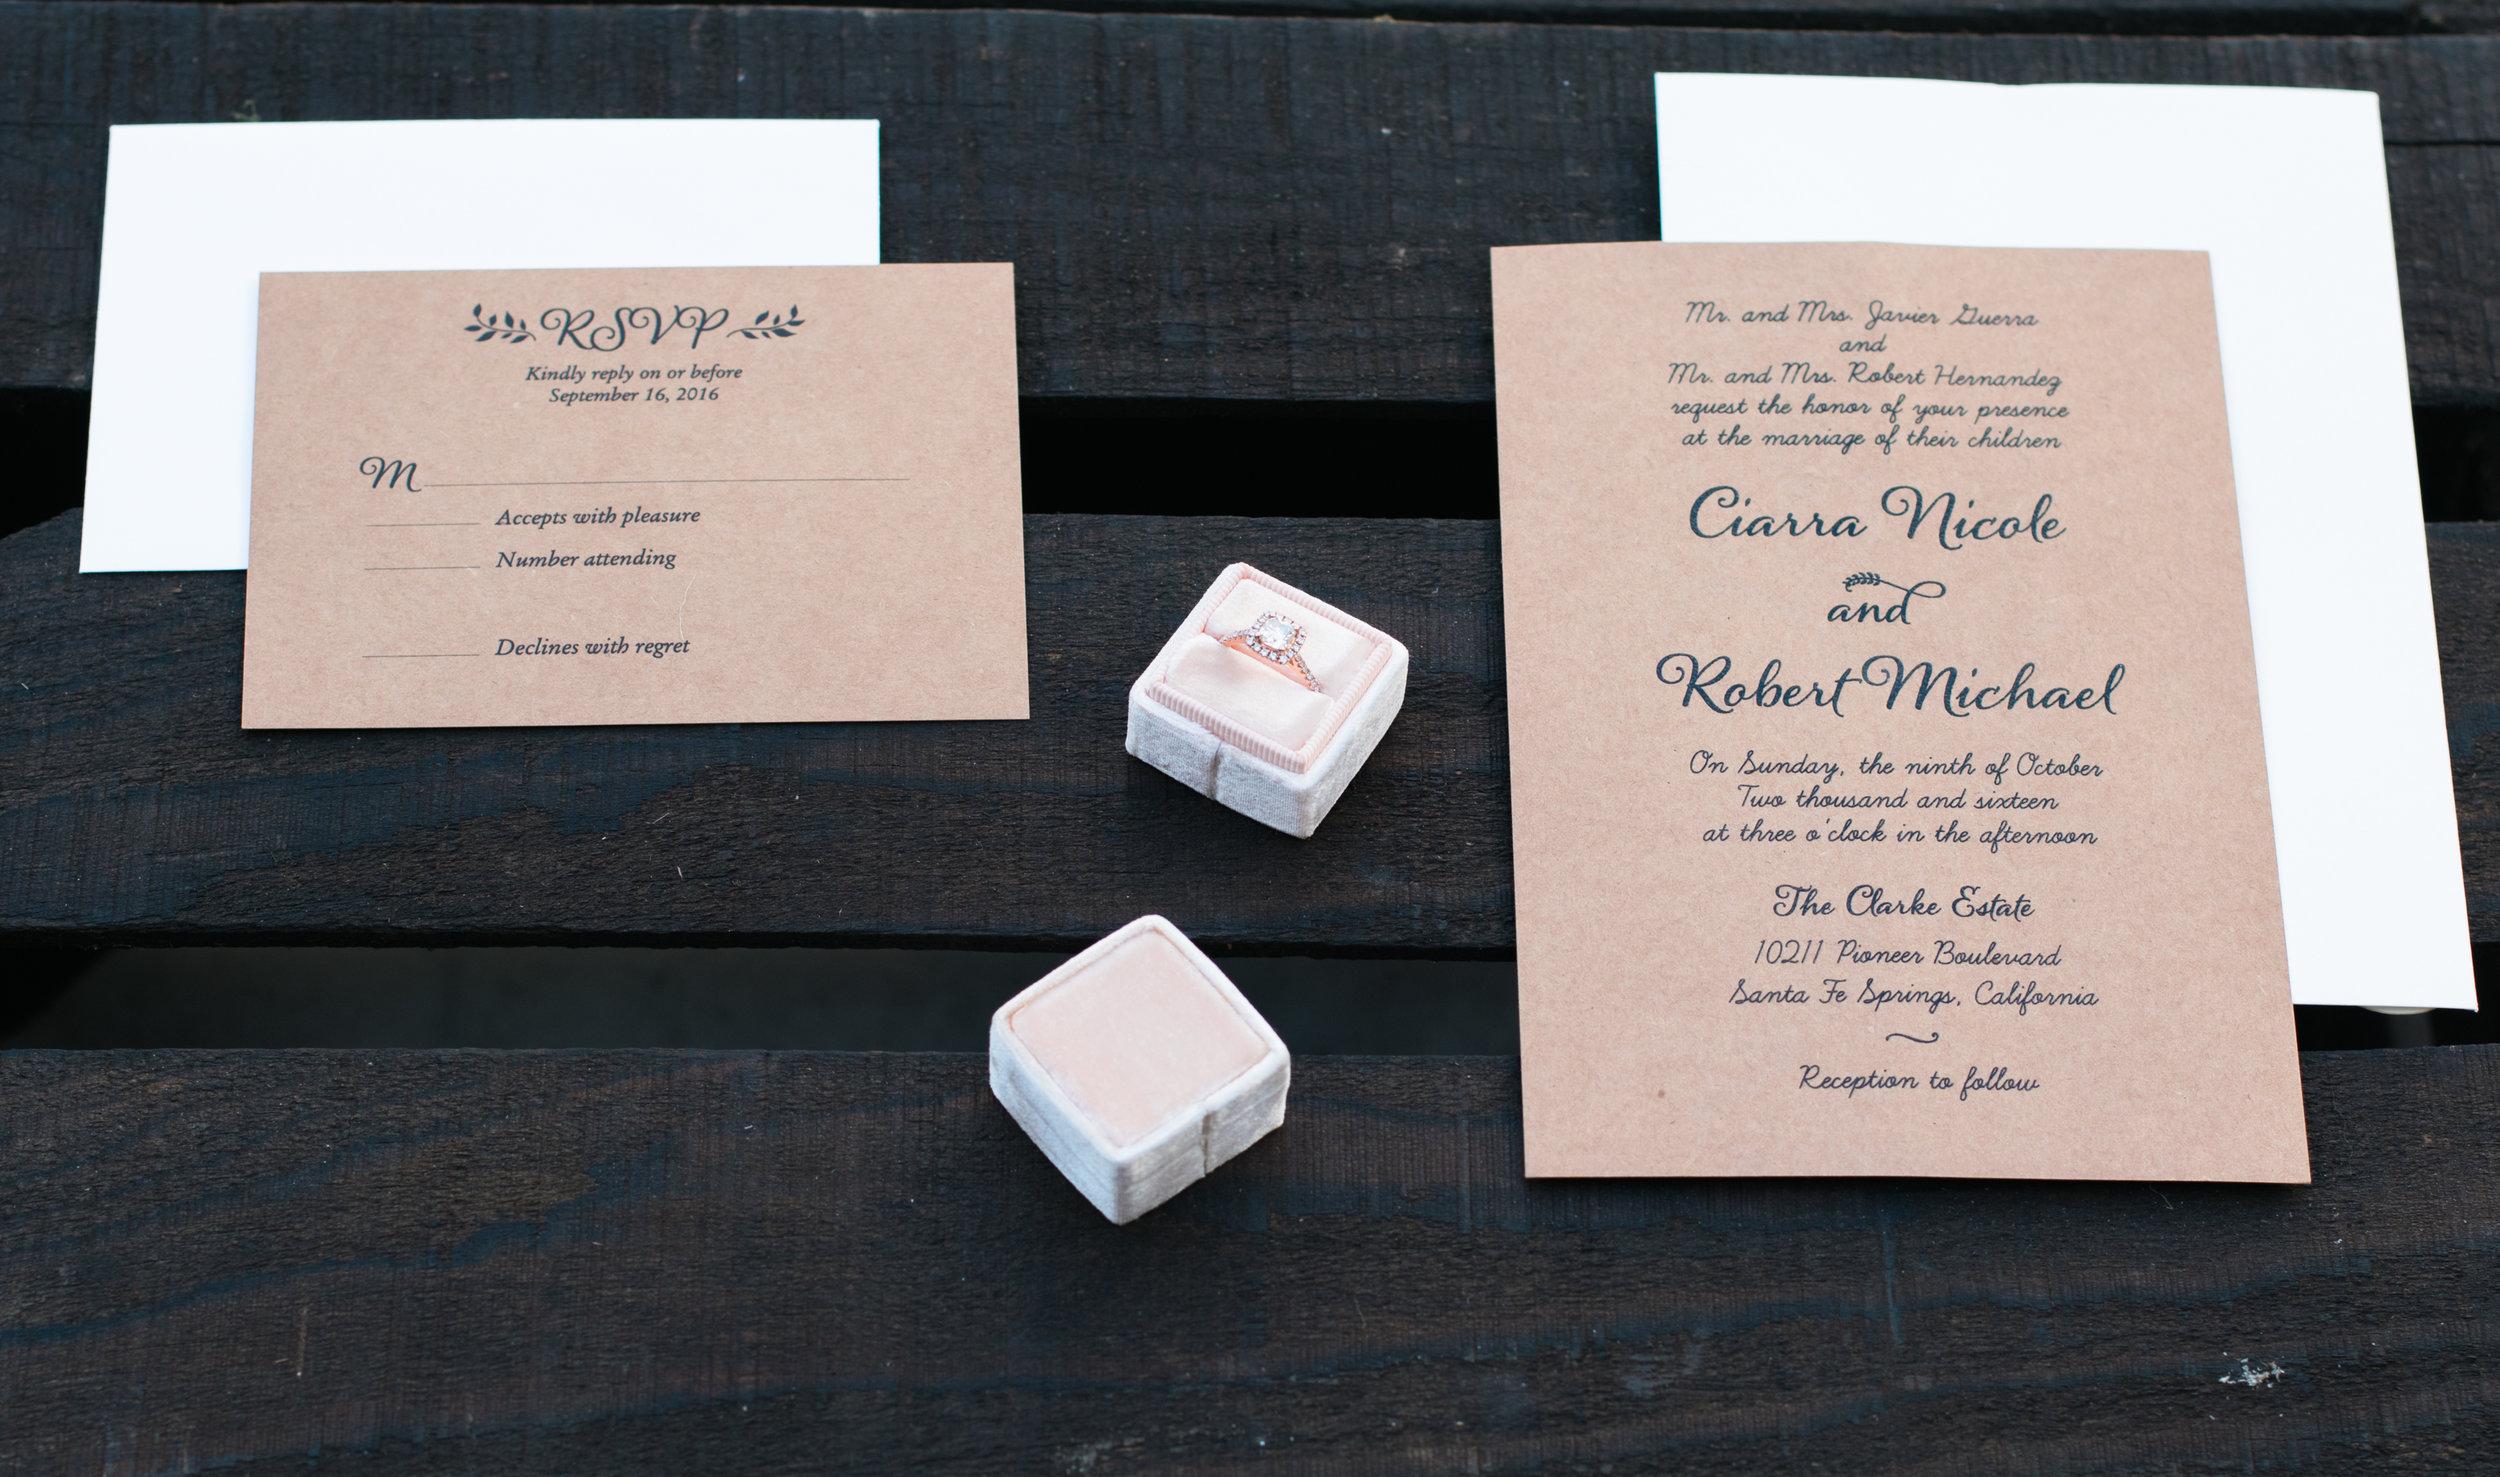 www.bonphotage.com Bonphotage California Wedding Photography